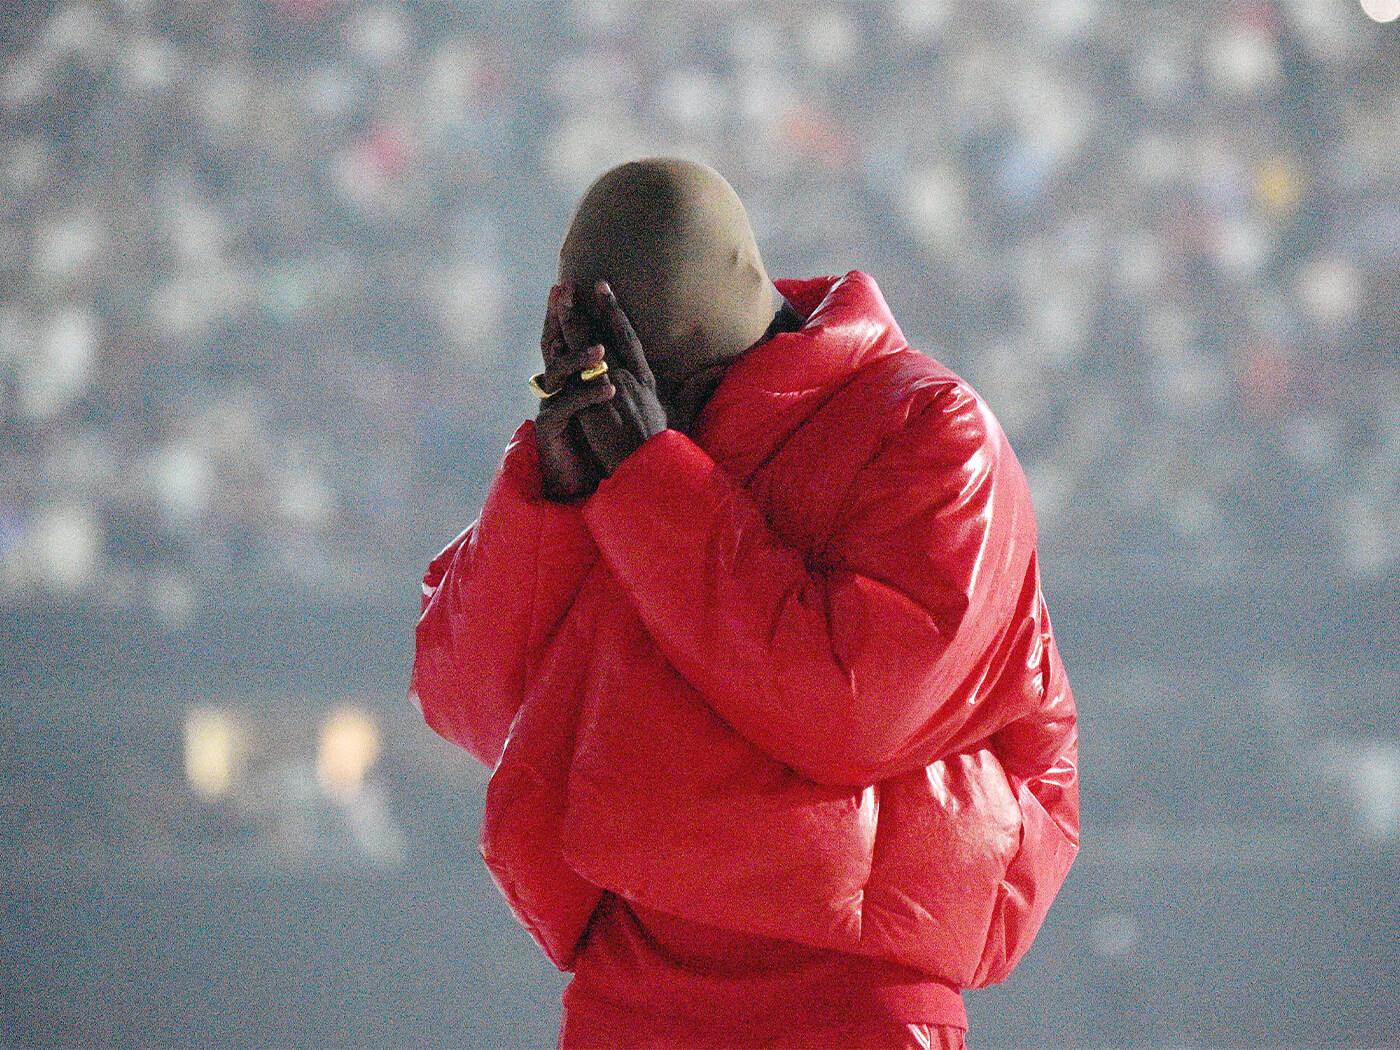 Kanye West at the Donda listenening event